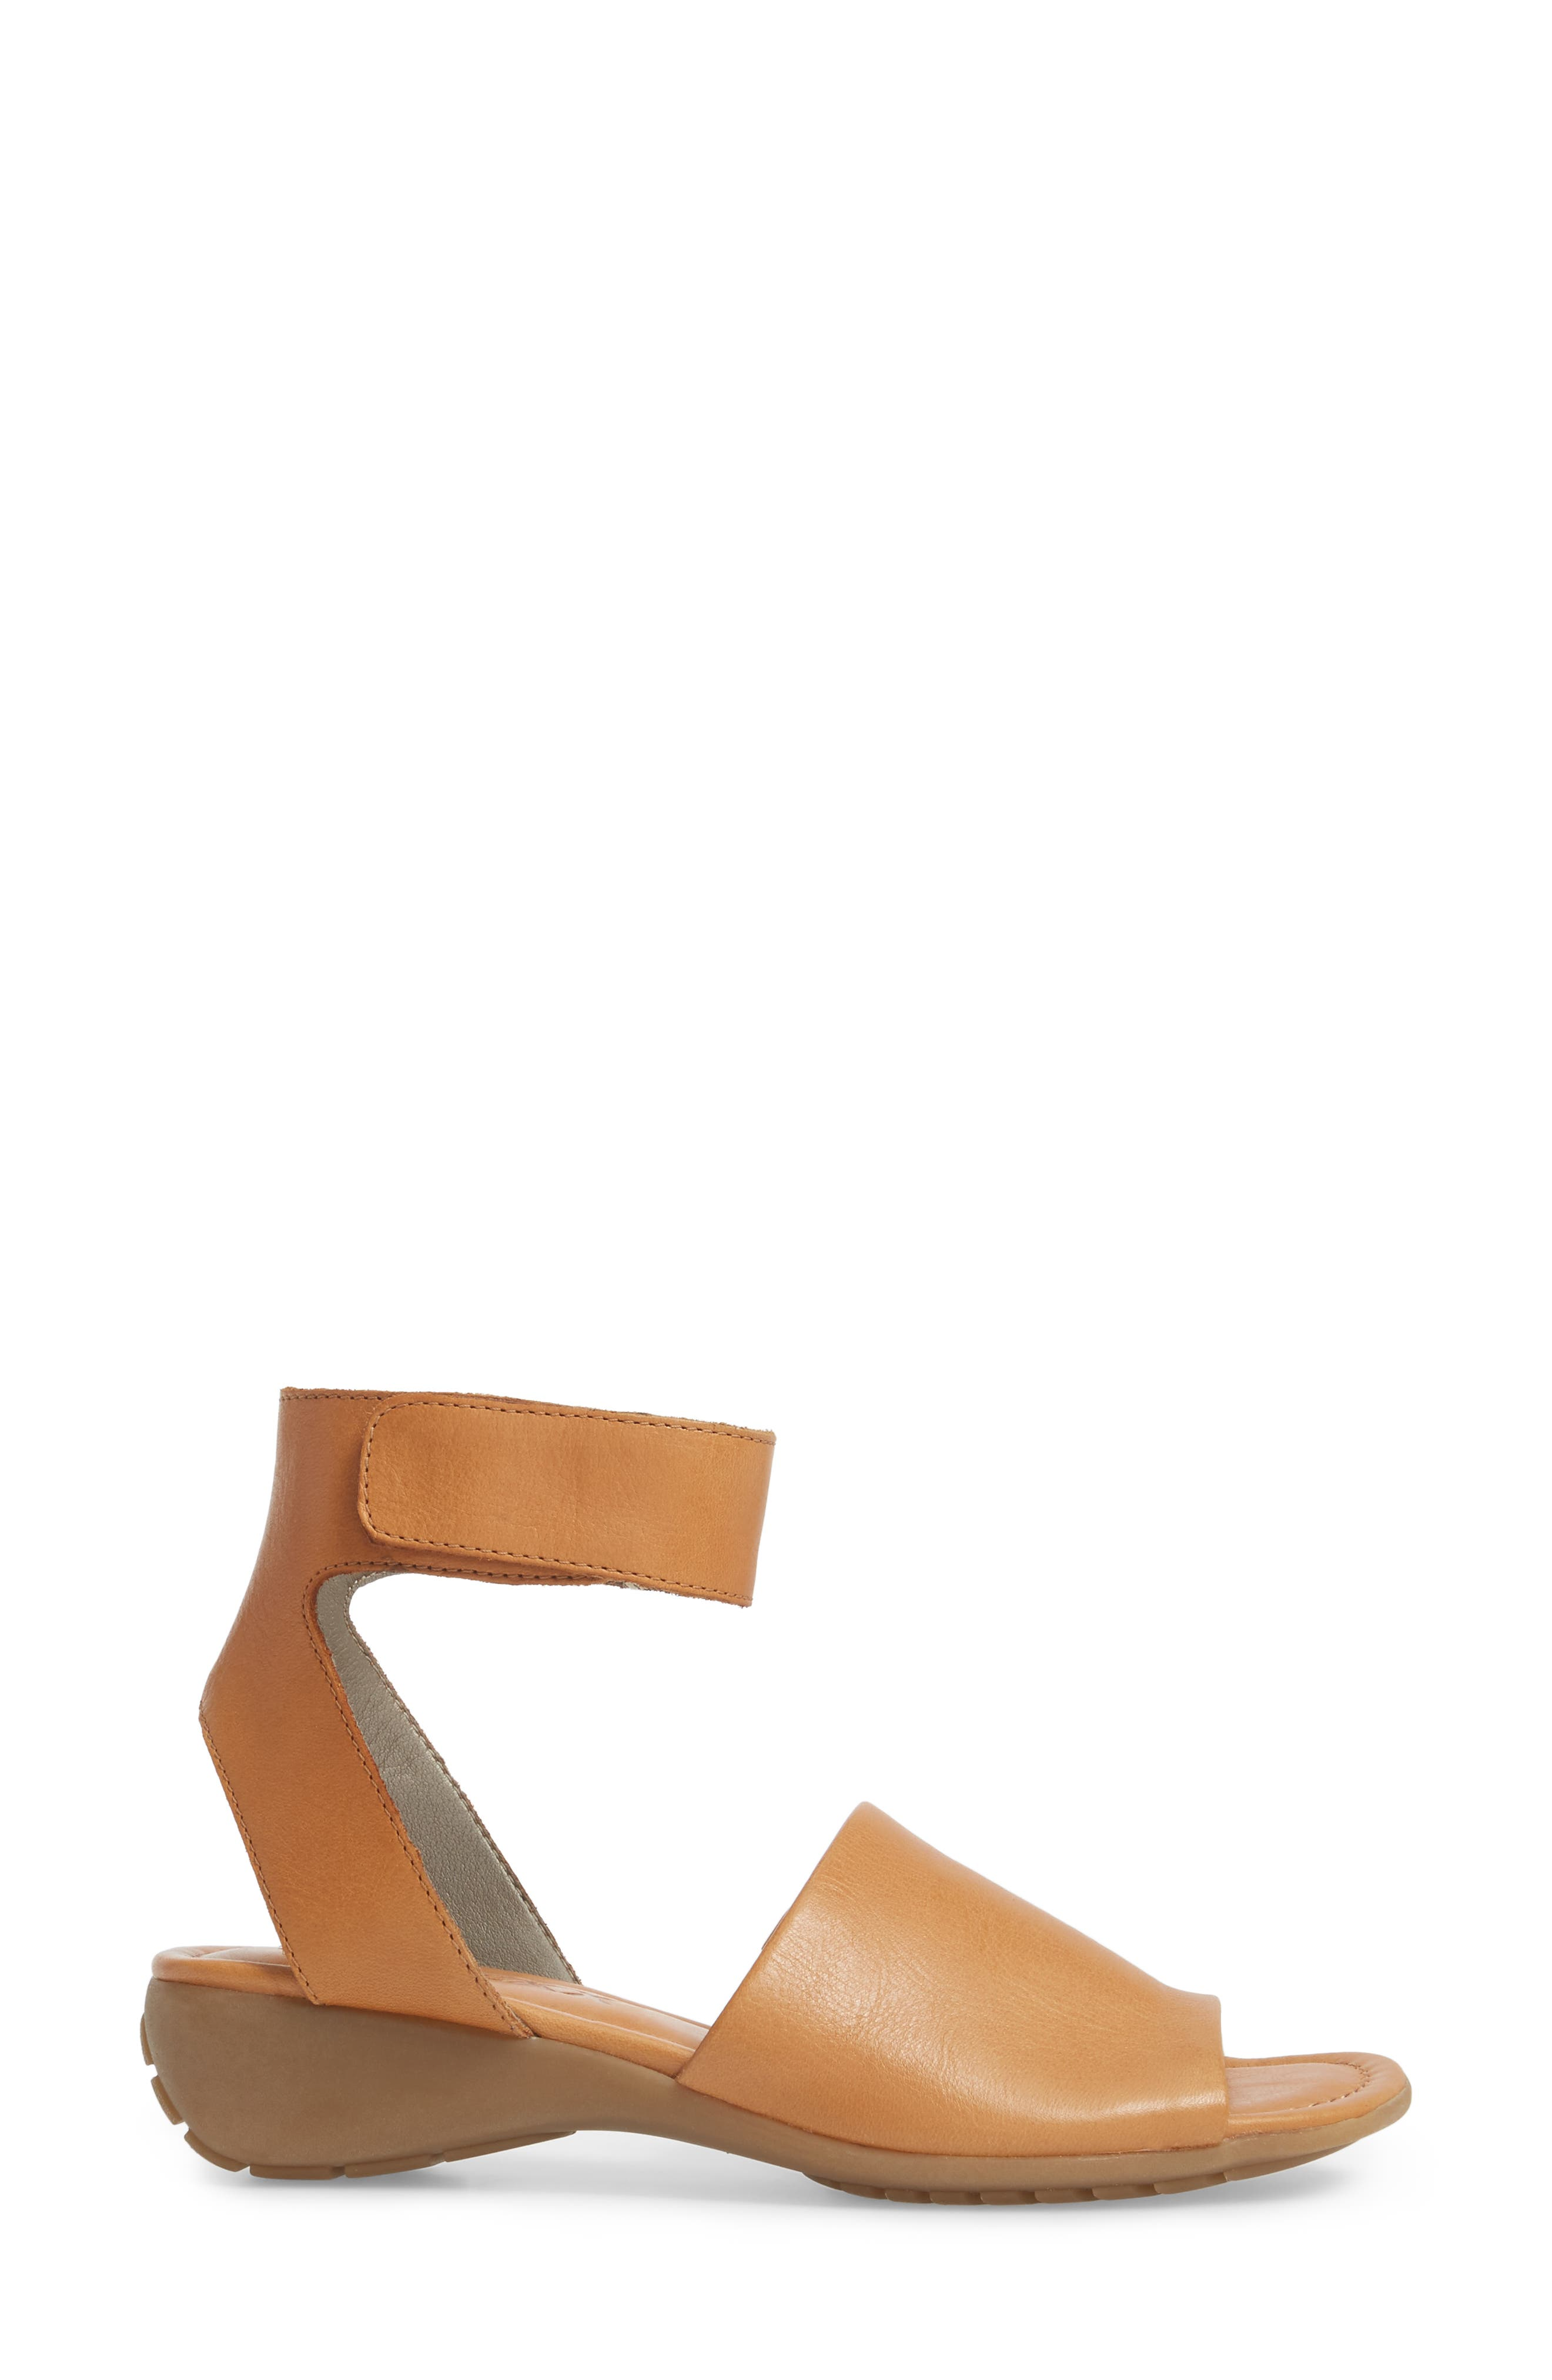 'Beglad' Leather Ankle Strap Sandal,                             Alternate thumbnail 35, color,